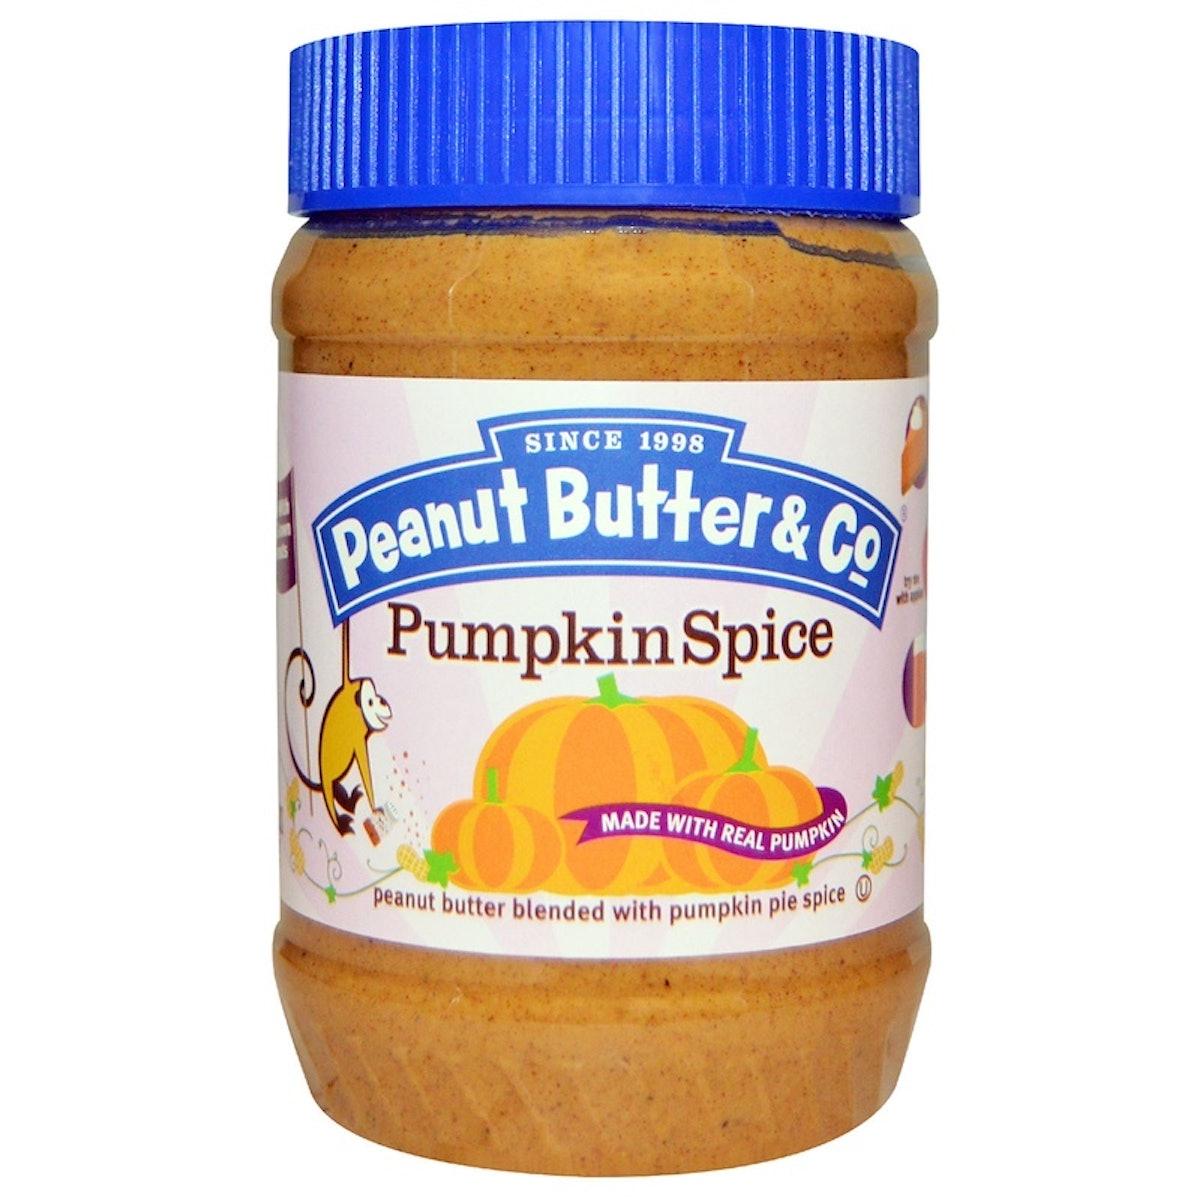 Peanut Butter & Co., Pumpkin Spice